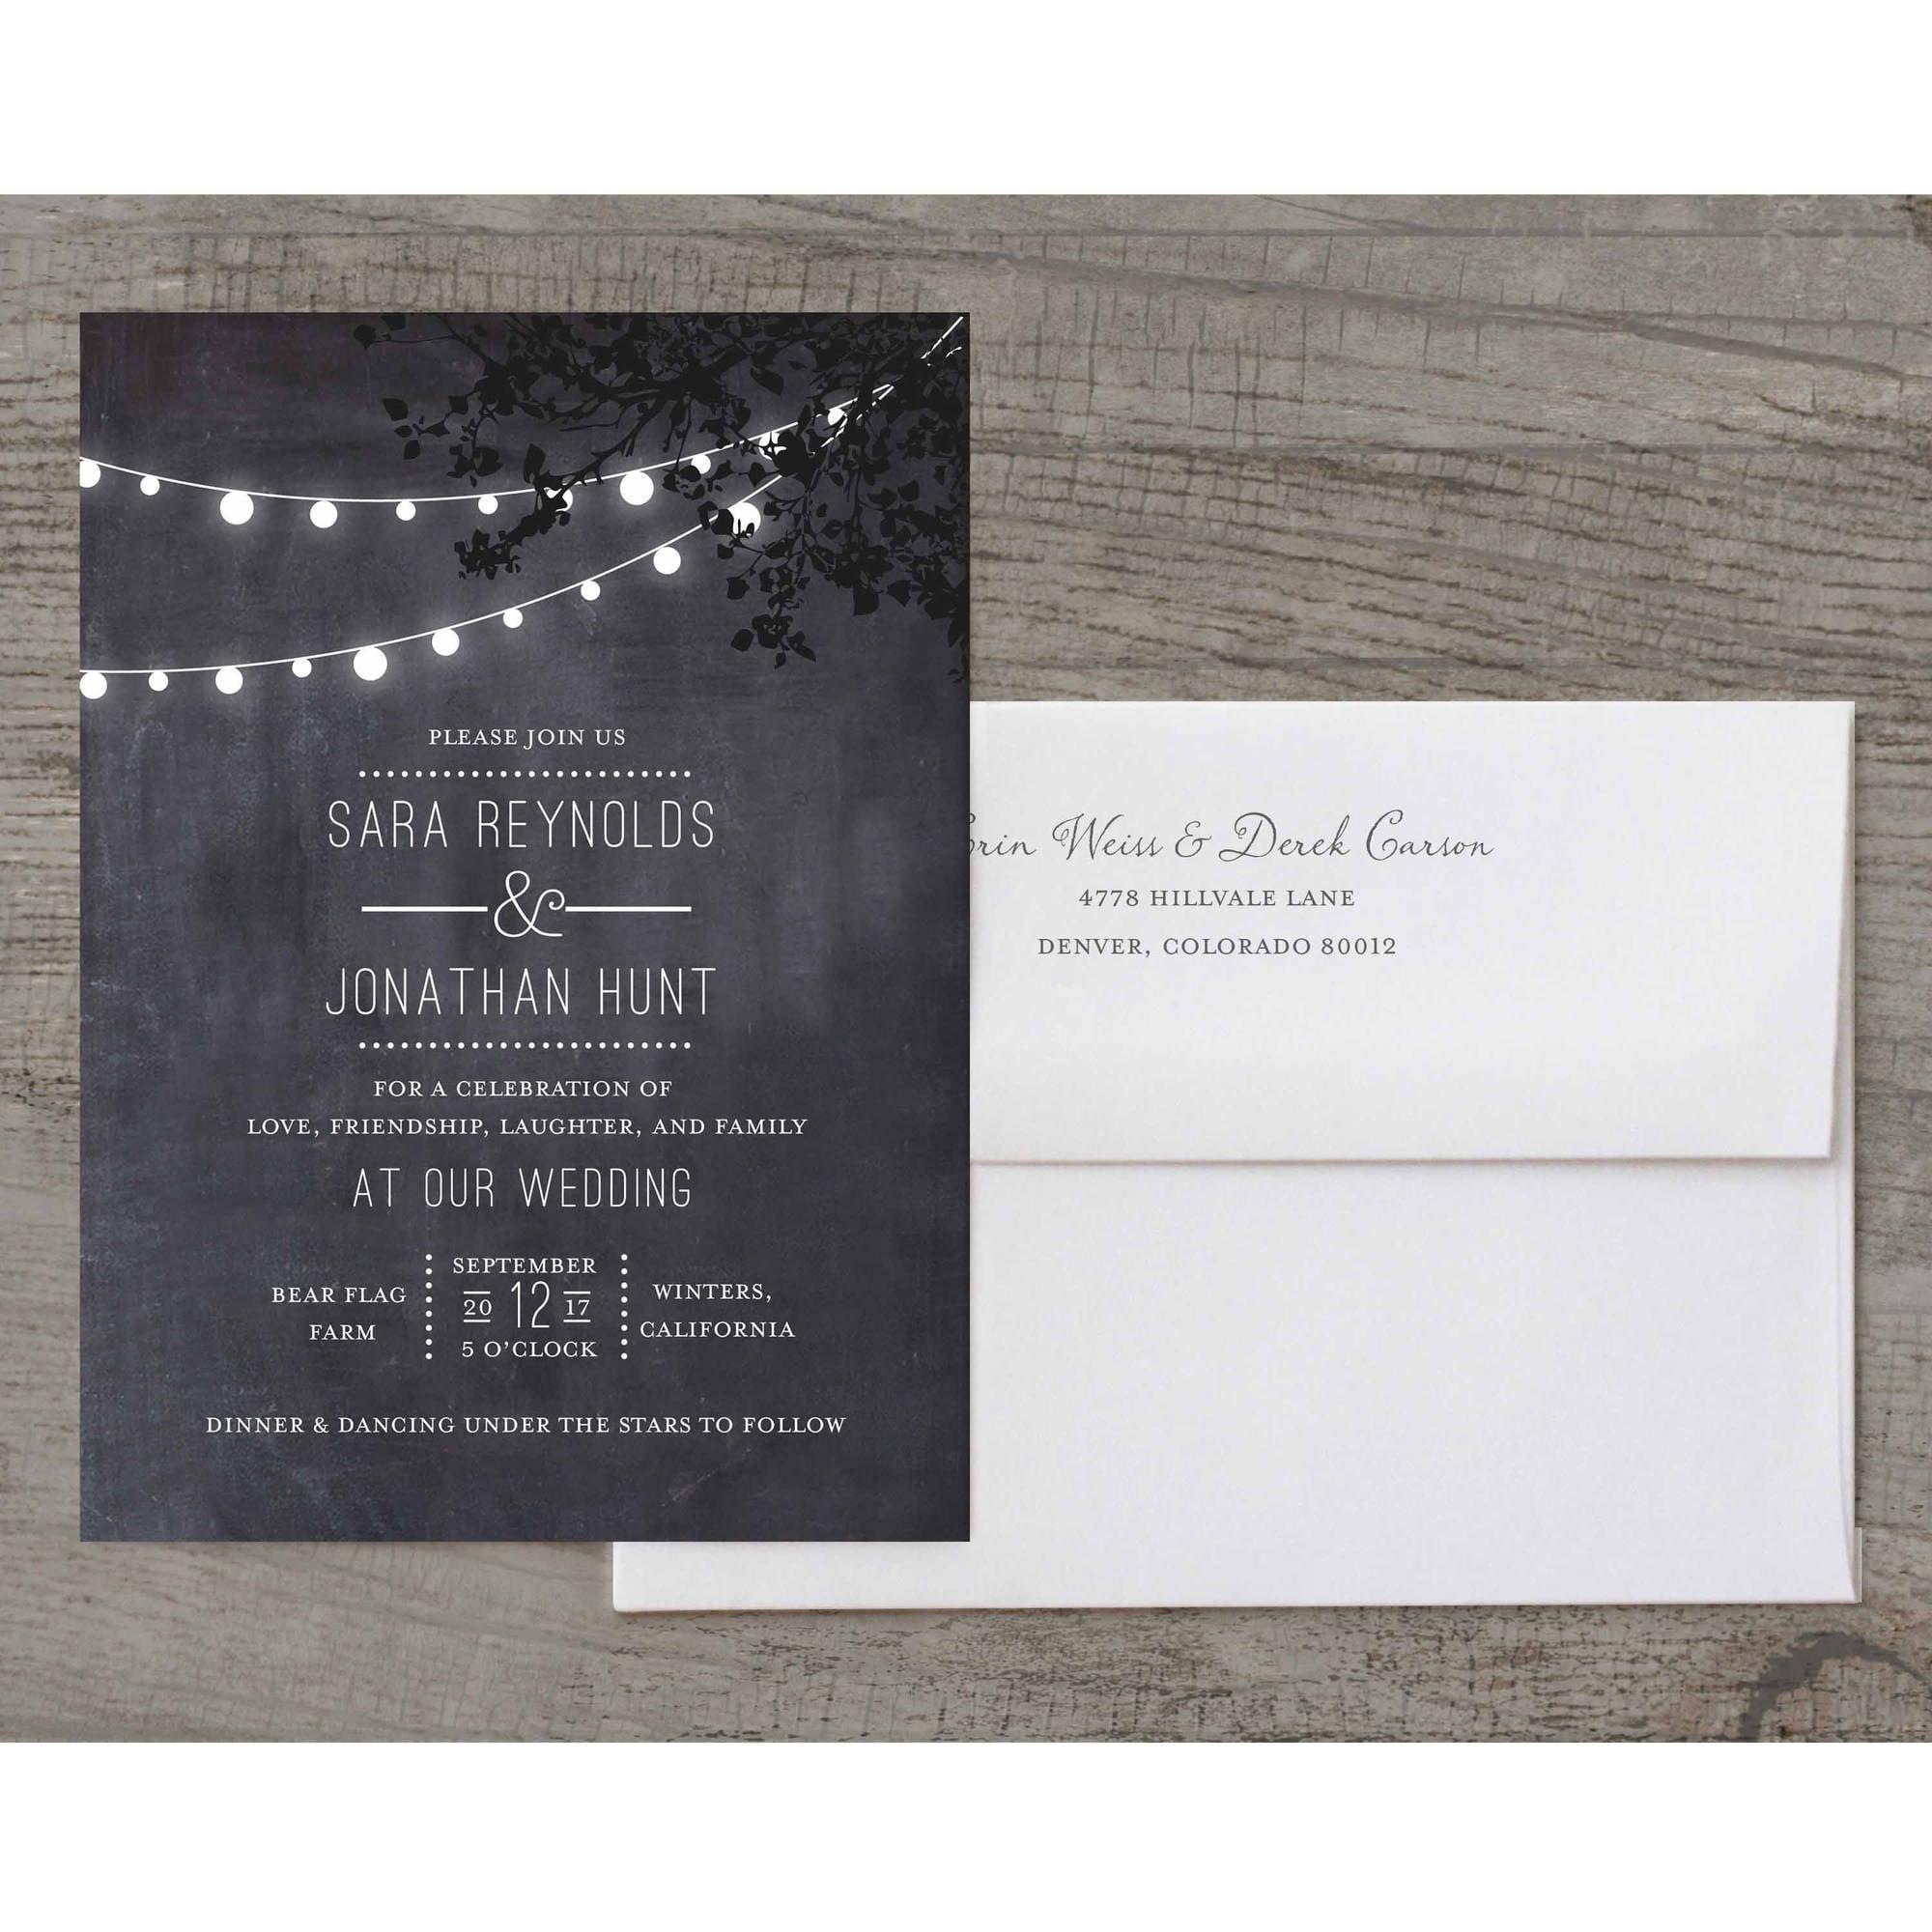 Wedding invitations wedding glow deluxe wedding invitation filmwisefo